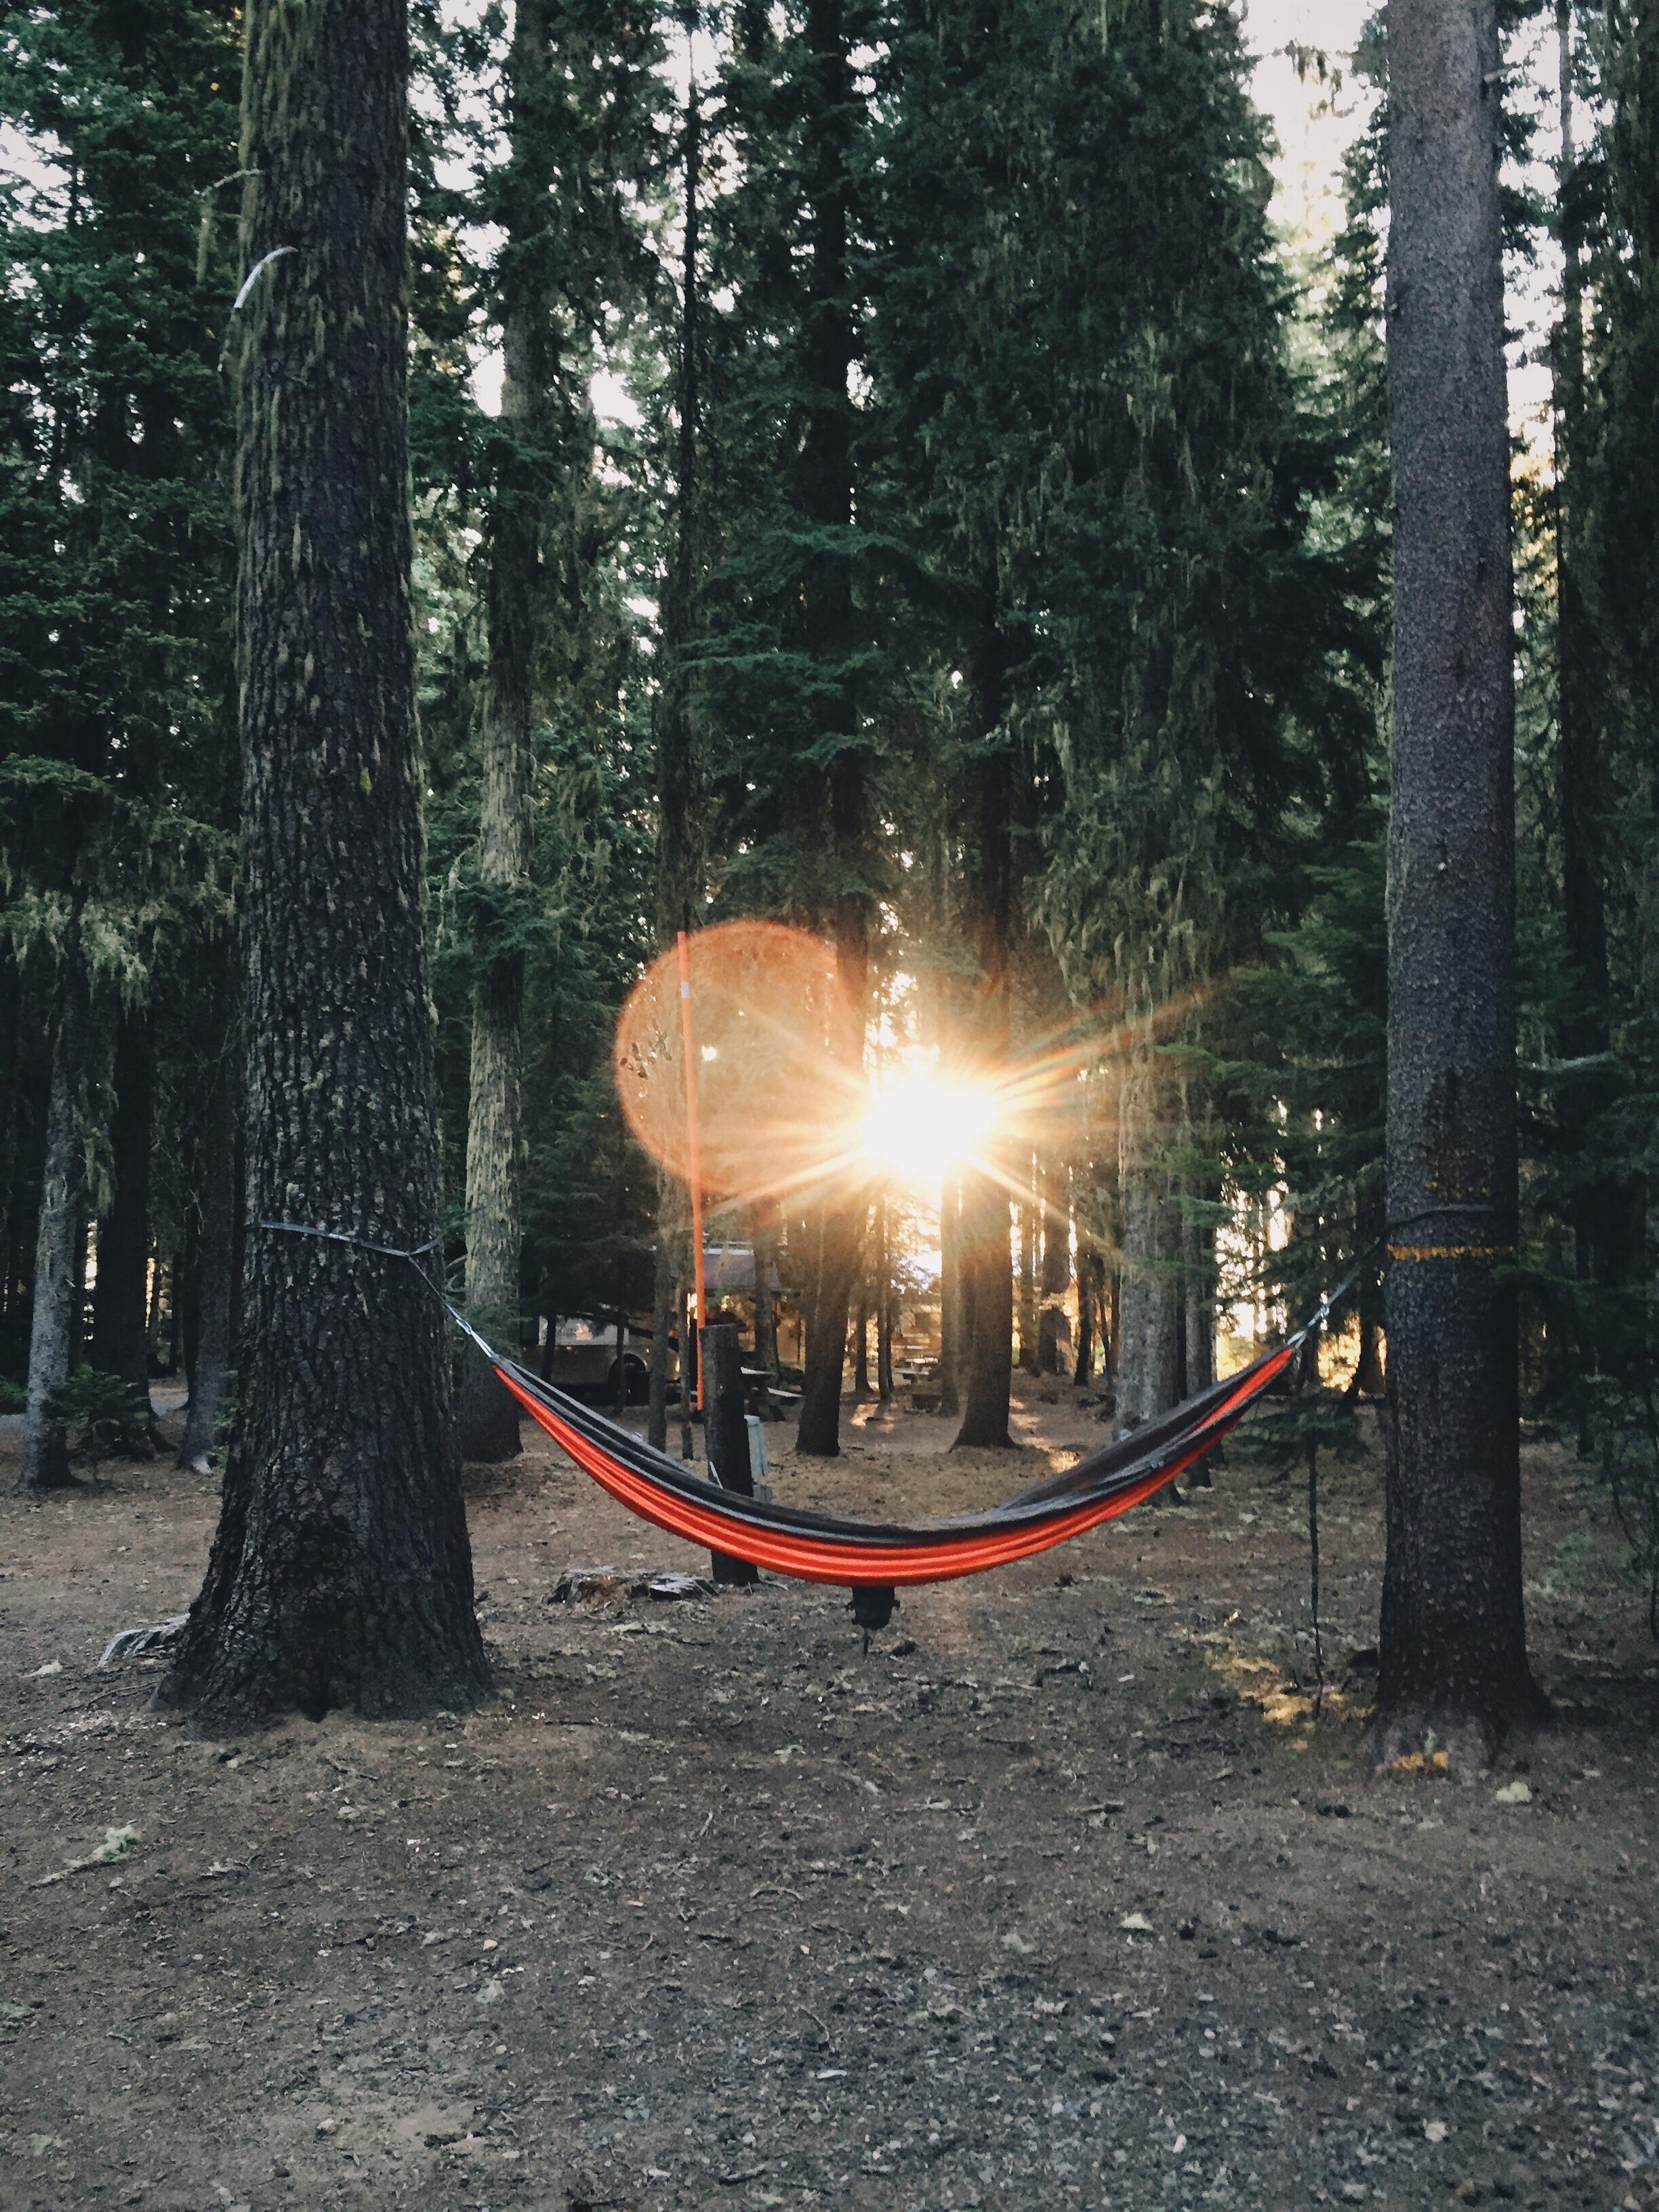 Jennys hammock.